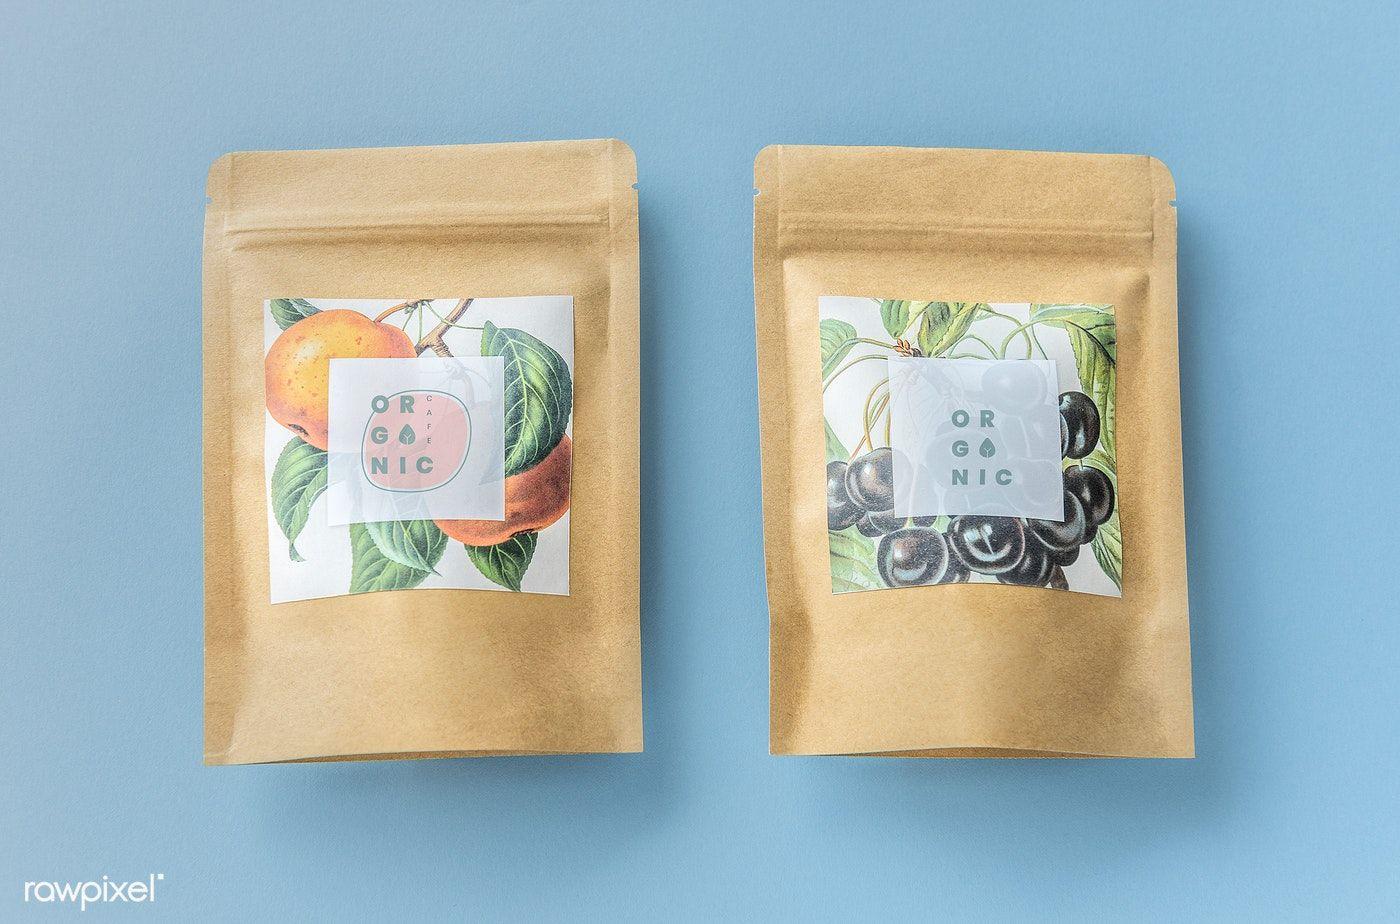 Download Organic Tea Branding And Packaging Mockup Free Image By Rawpixel Com Ake Organic Tea Brands Tea Box Design Tea Brands